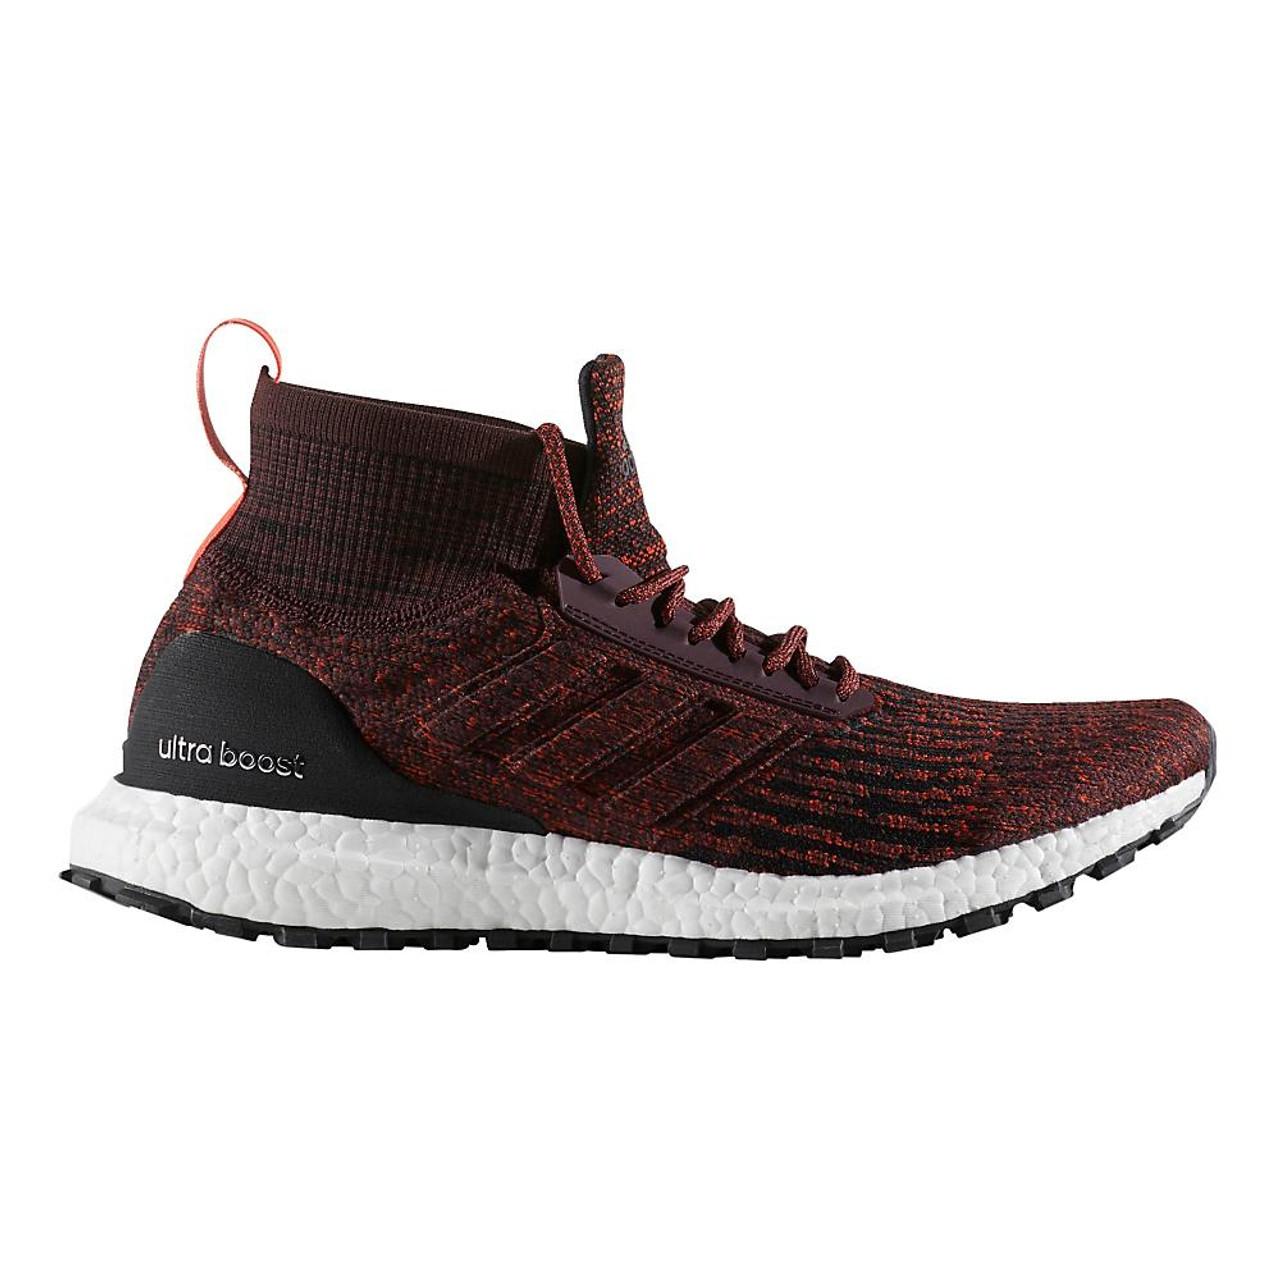 adidas Ultra Boost ATR Running Shoes